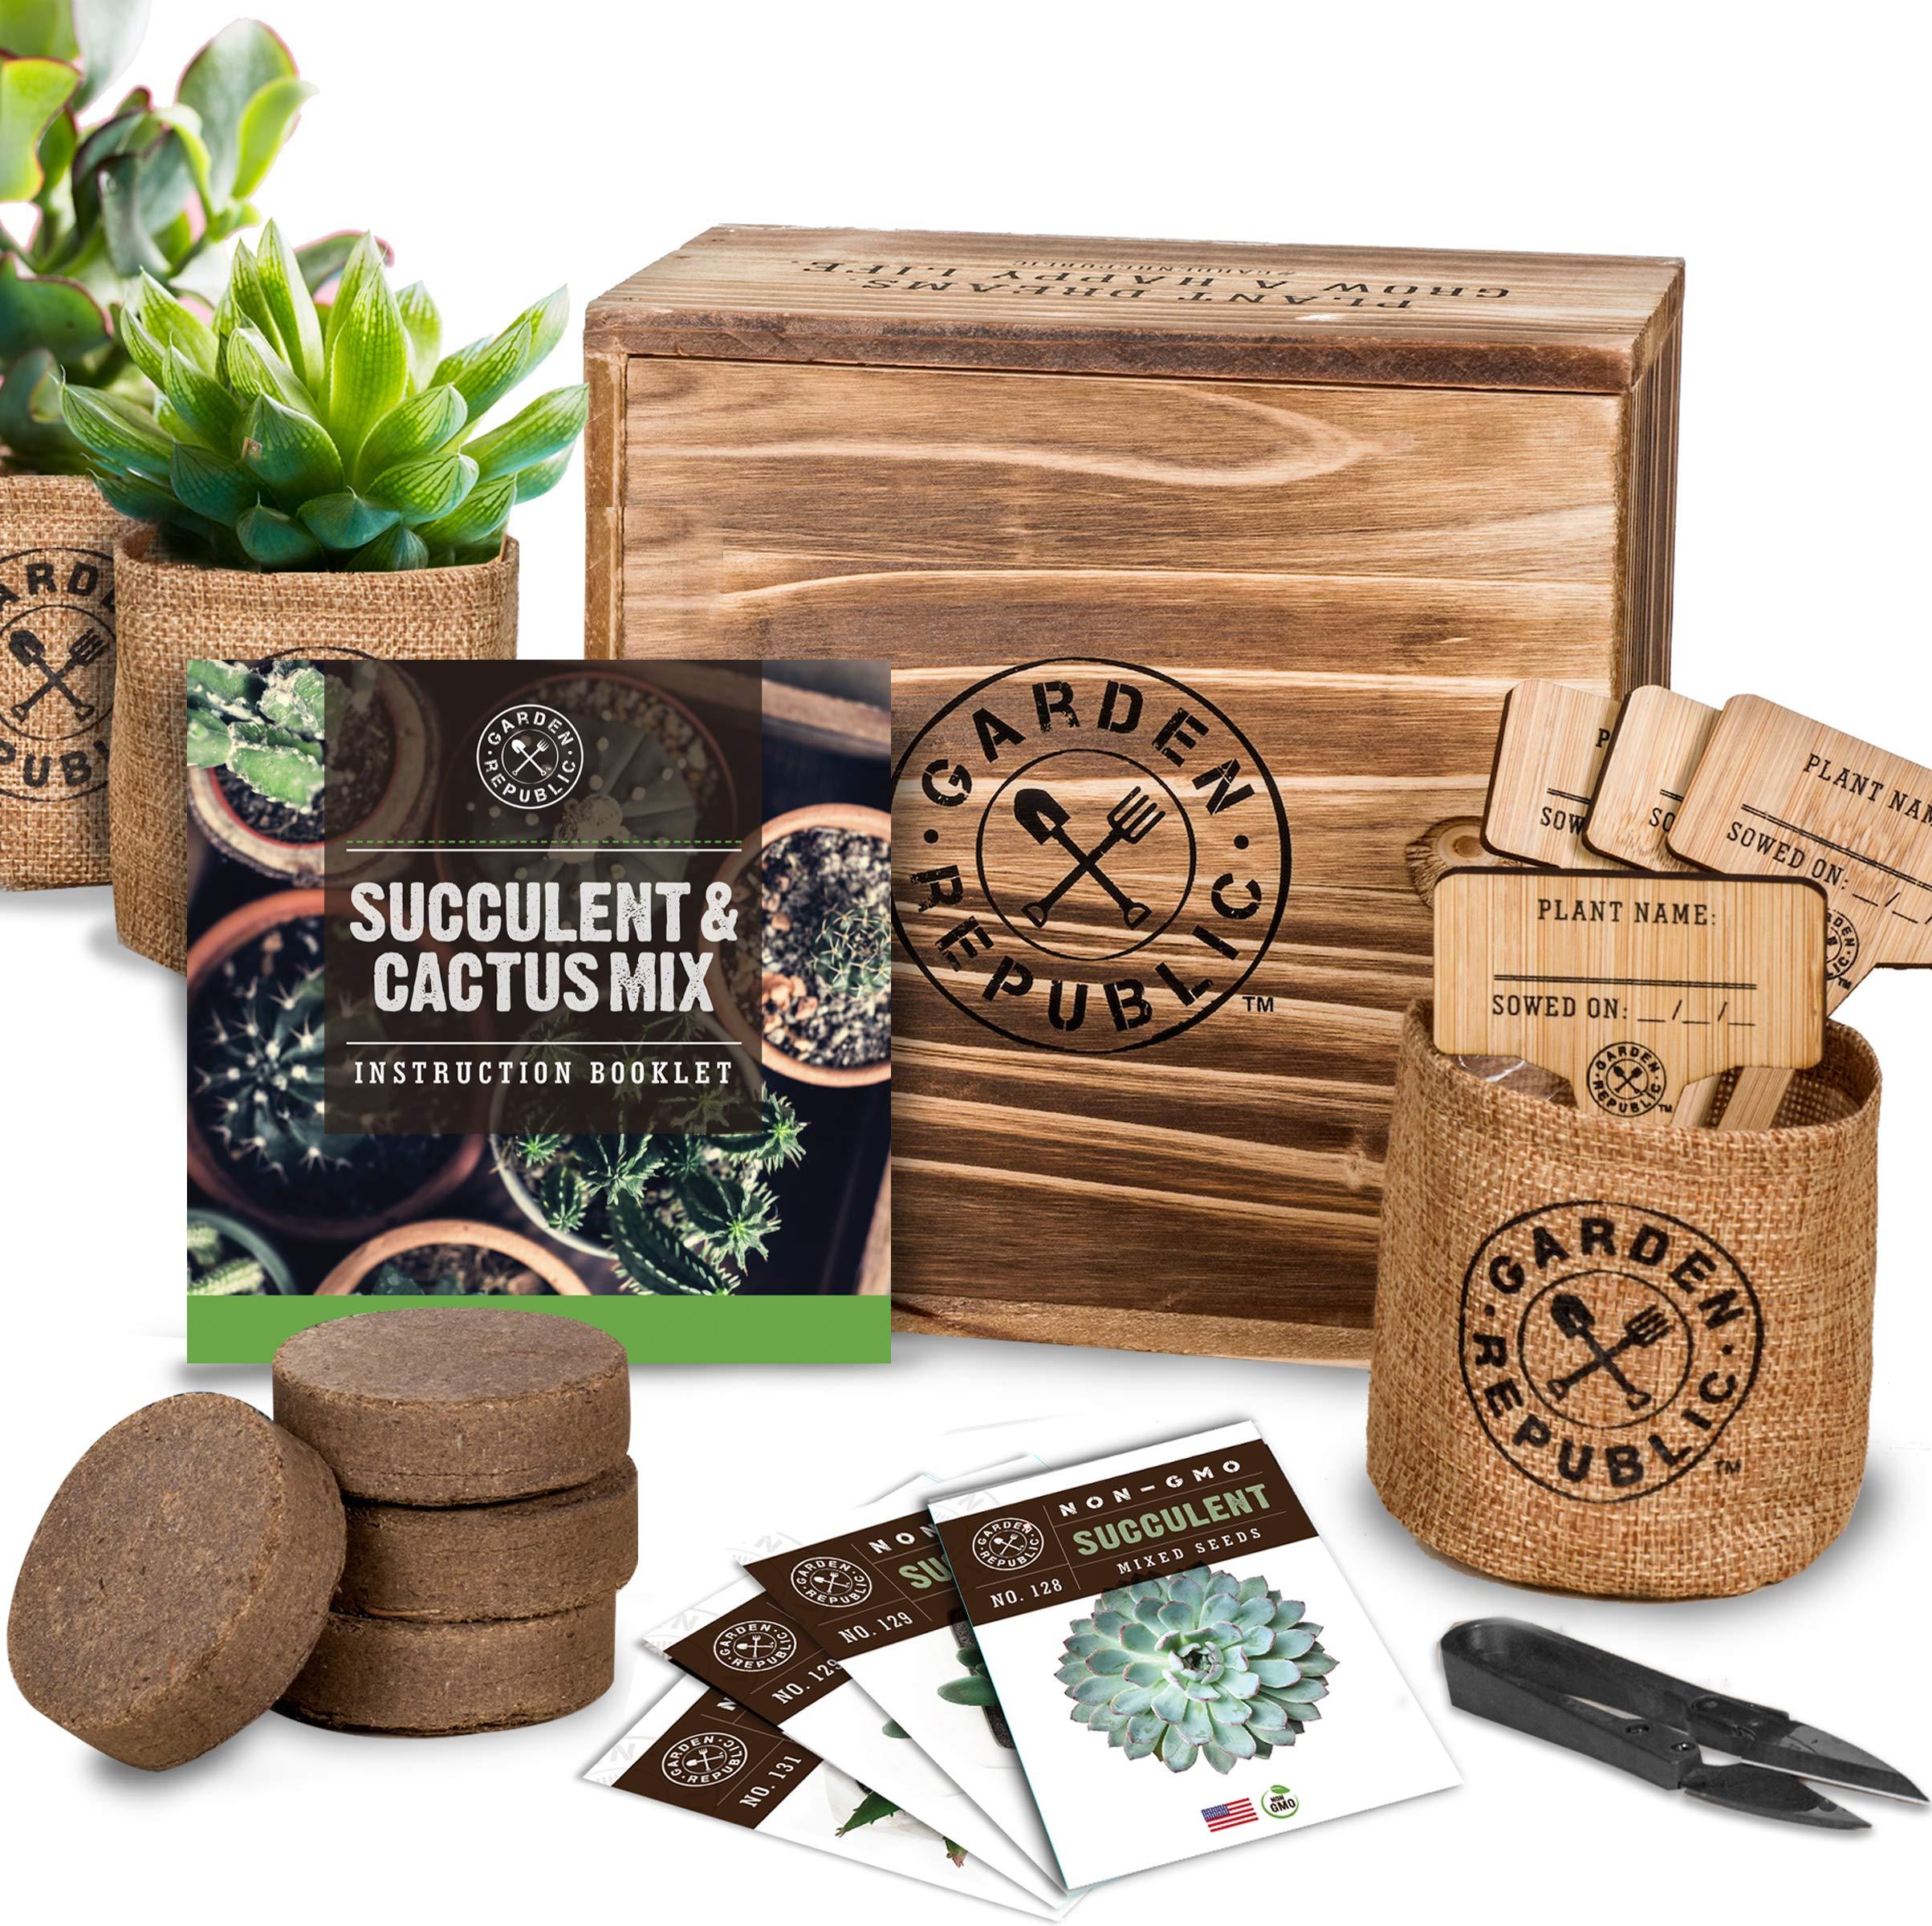 Cactus Succulent Seed Starter Kit - Indoor Garden Grow Kits, Seeds for Planting Mini Cactus Succulent Plants, Plant Markers, Soil, Pots, Wood Box - Gardening Gifts, Terrarium, Cacti Succulents Decor by · GARDEN REPUBLIC ·